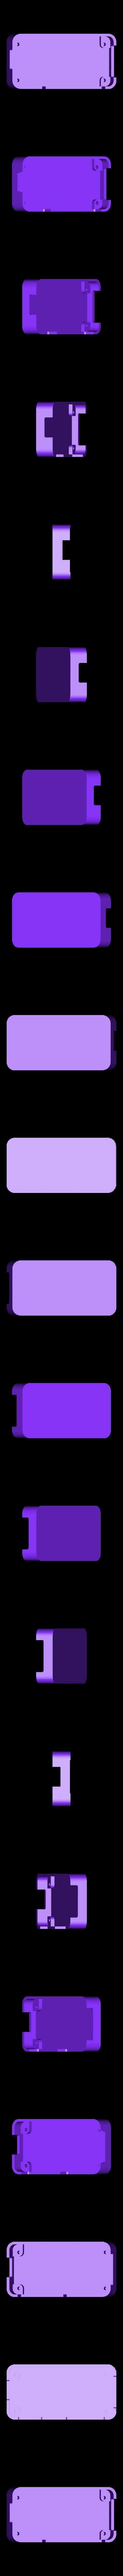 joybon-bot.stl Download free STL file Case for Adafruit Joy Bonnet - Raspberry Pi Zero W • 3D printable object, Adafruit